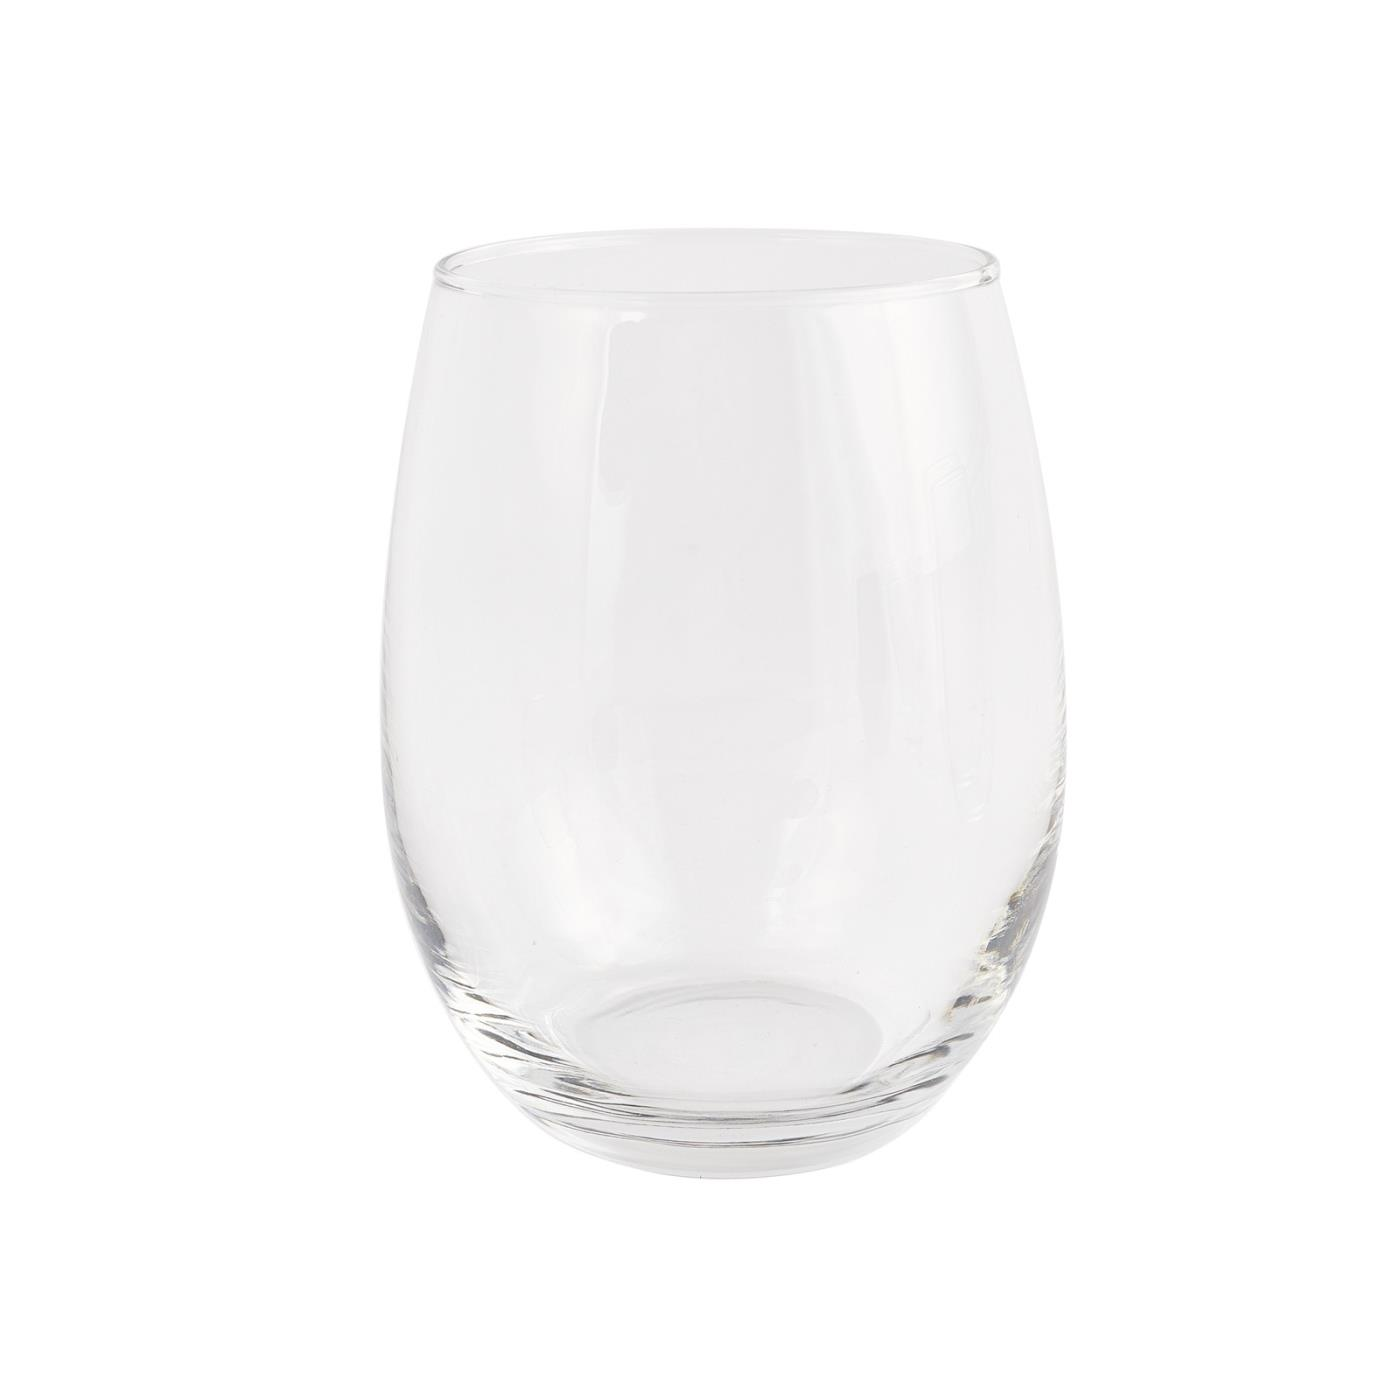 Stemless Wine Glass - 21 oz